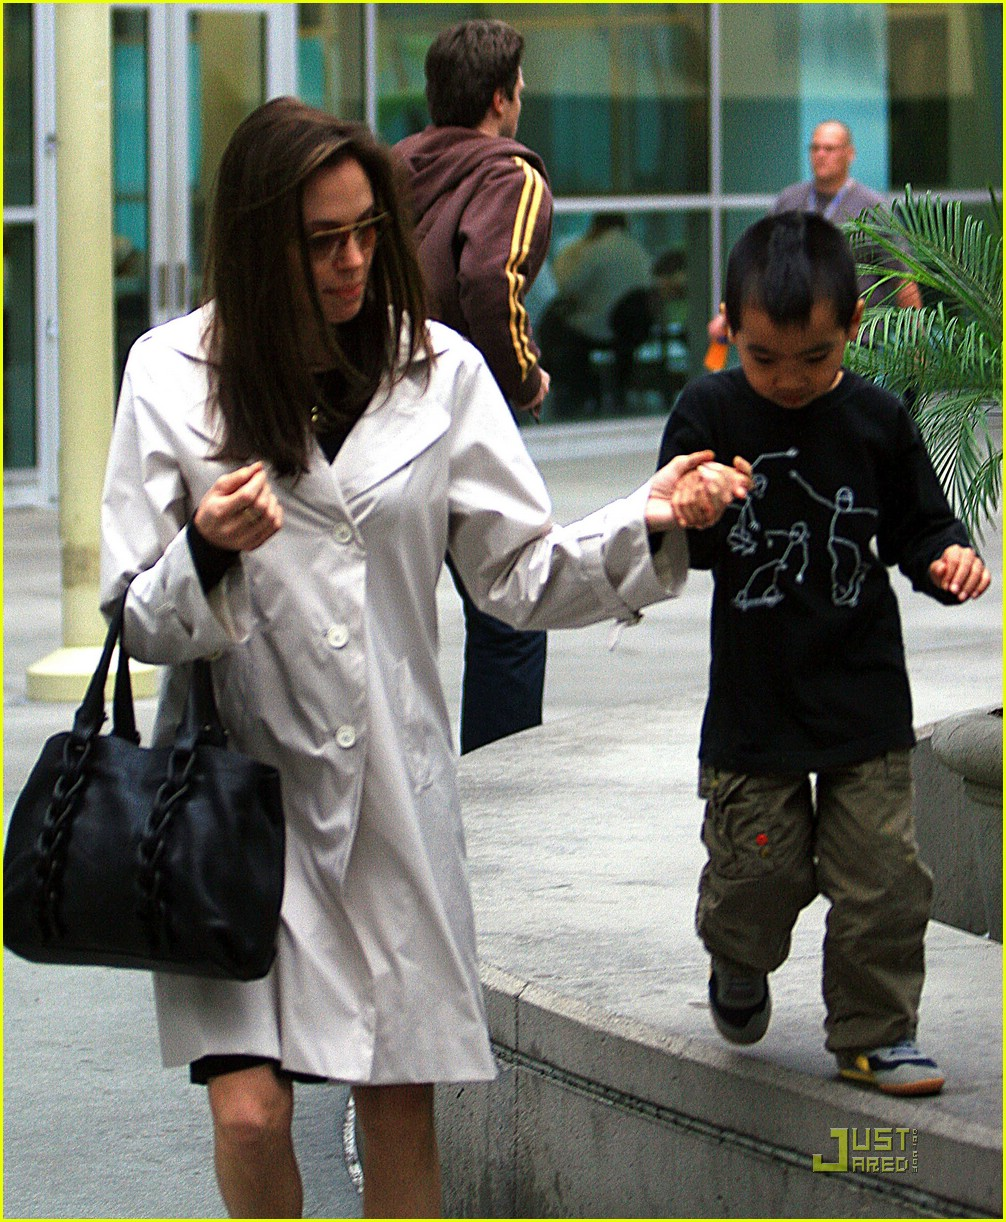 Celebrity babies: Maddox Jolie-Pitt - YouTube